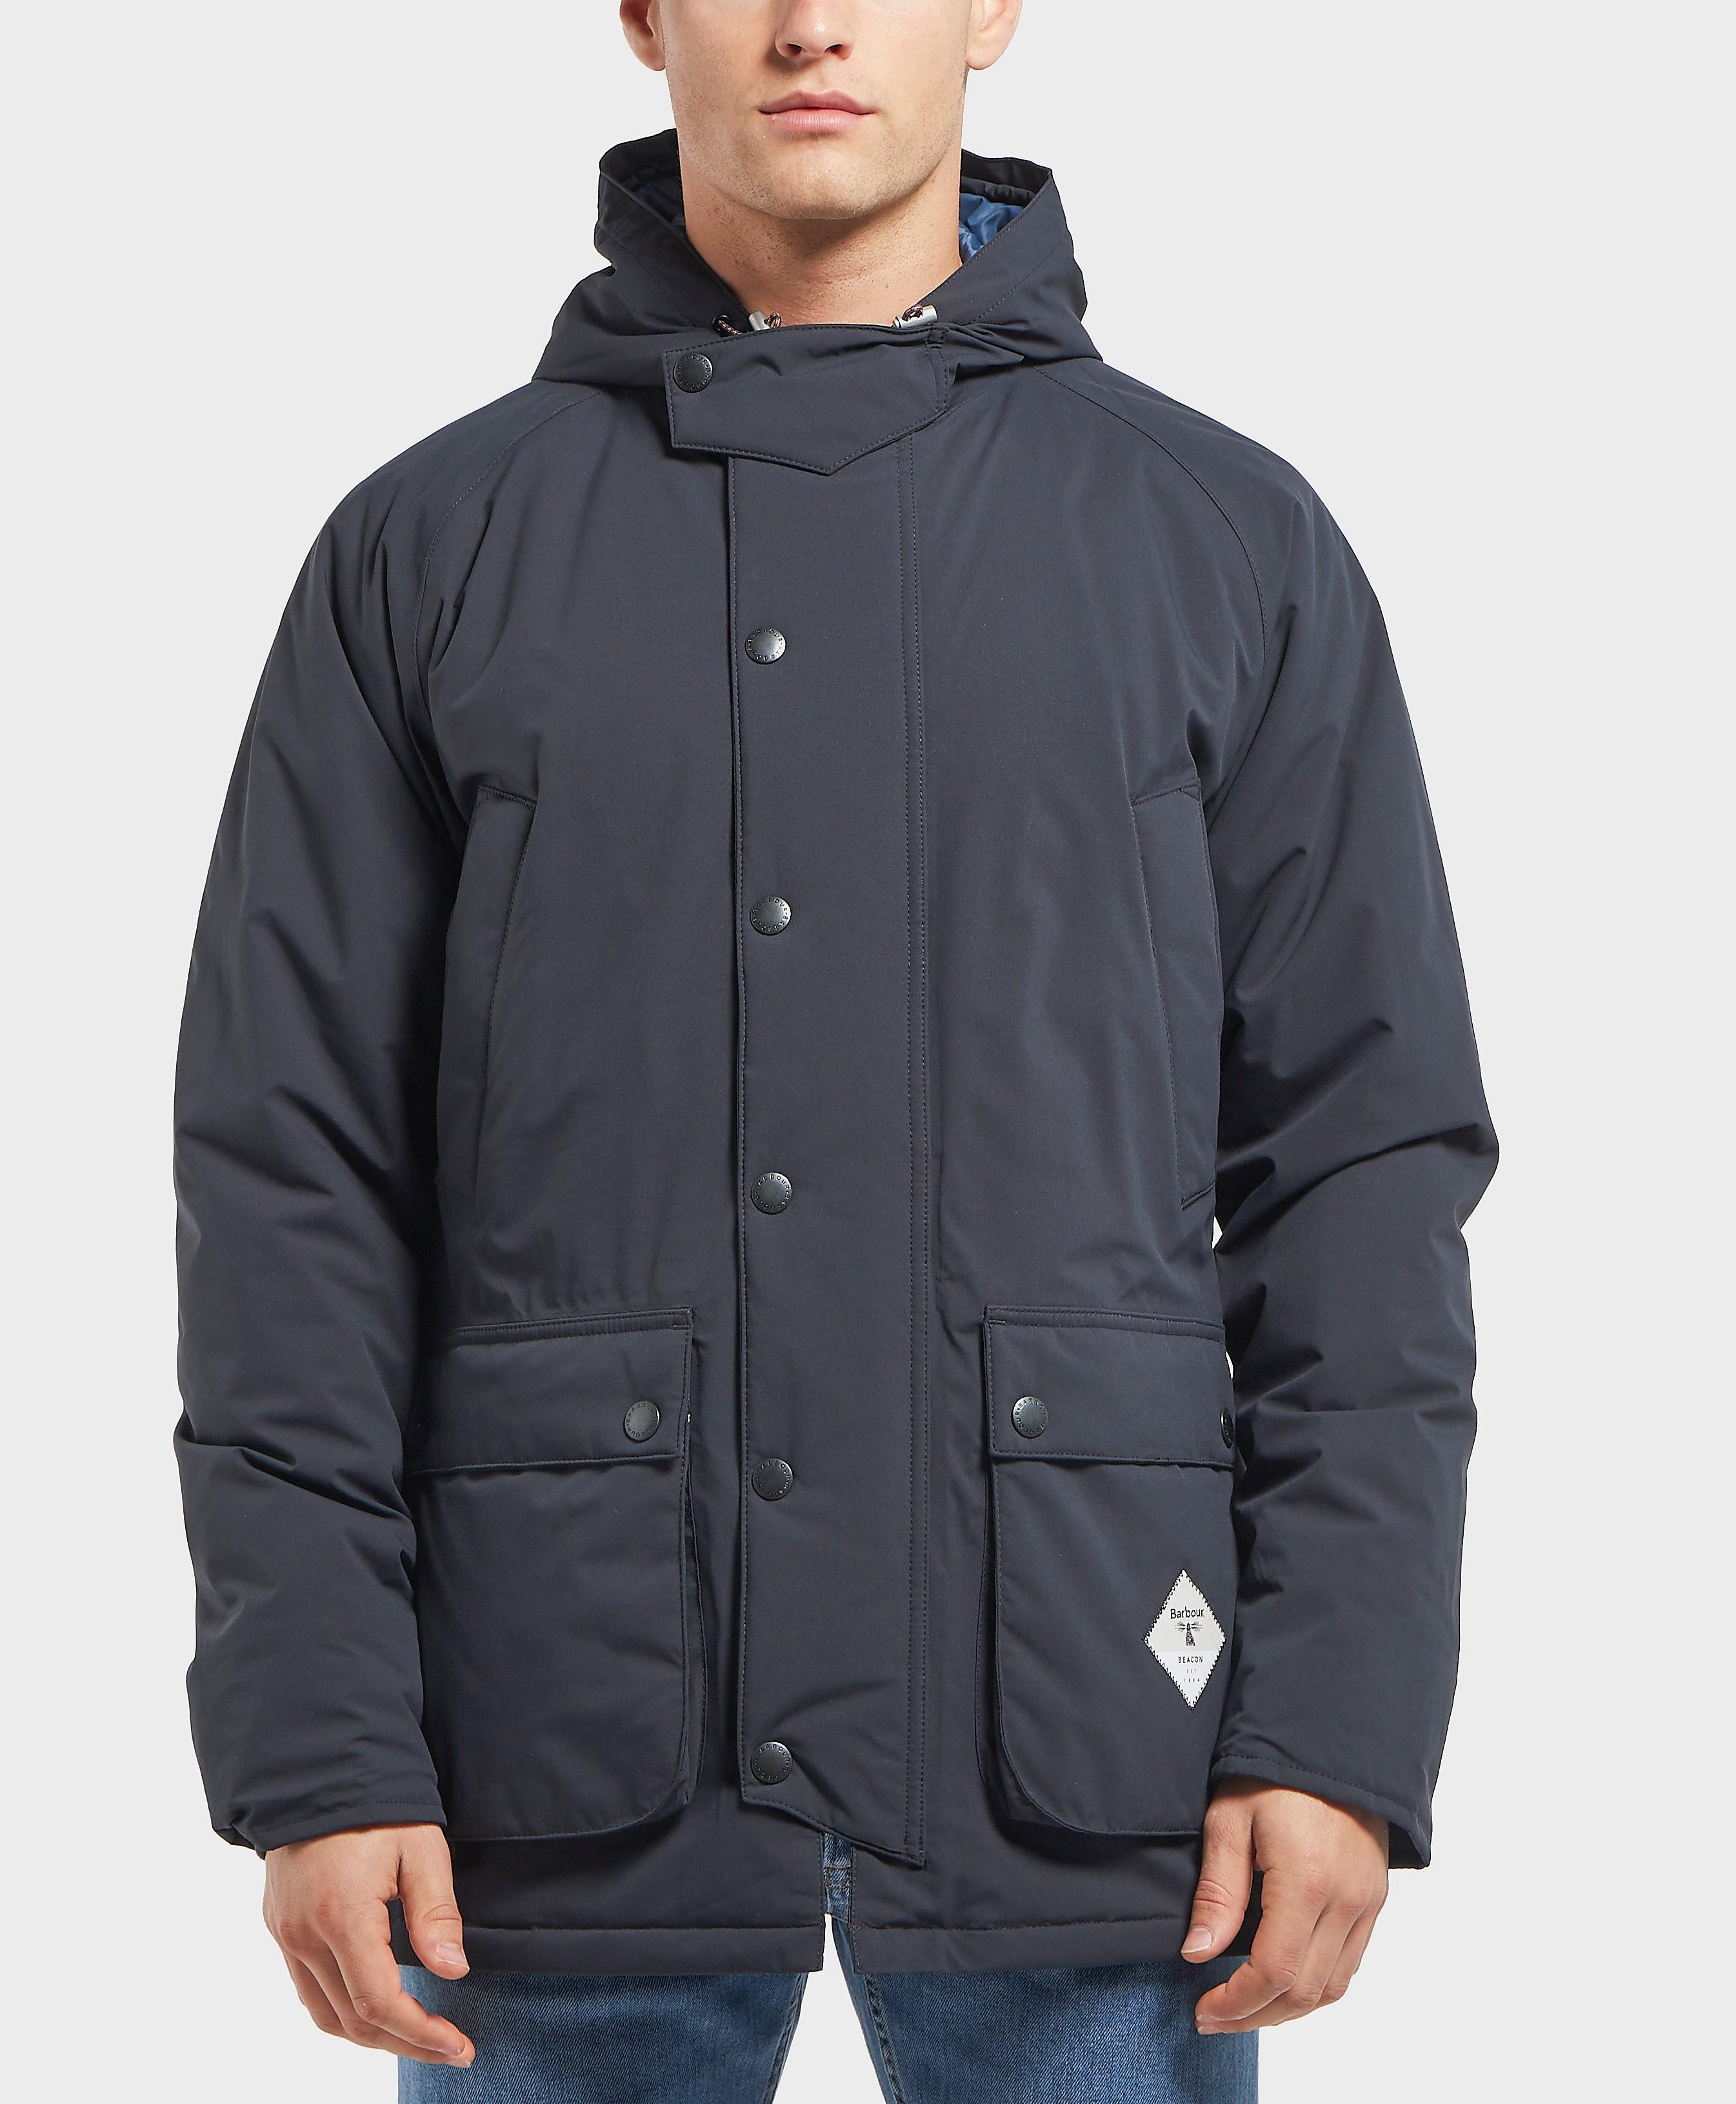 Barbour Beacon Fell Waterproof Parka Jacket